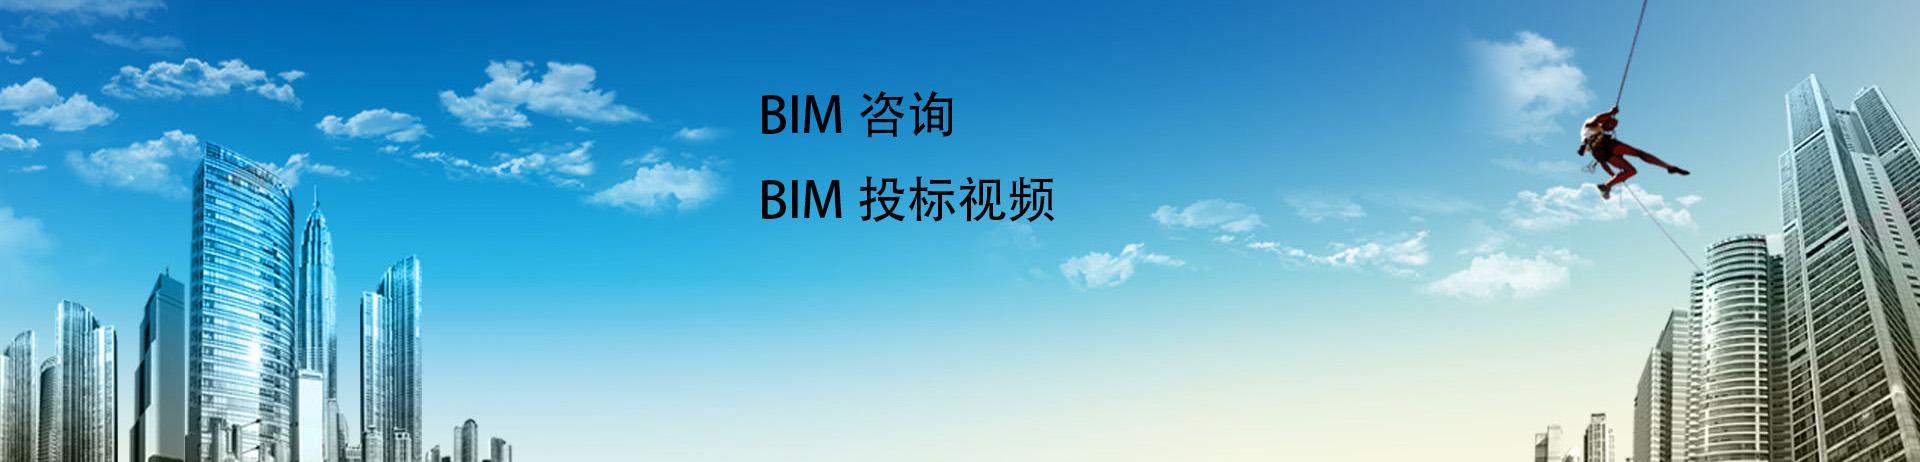 BIM业务介绍